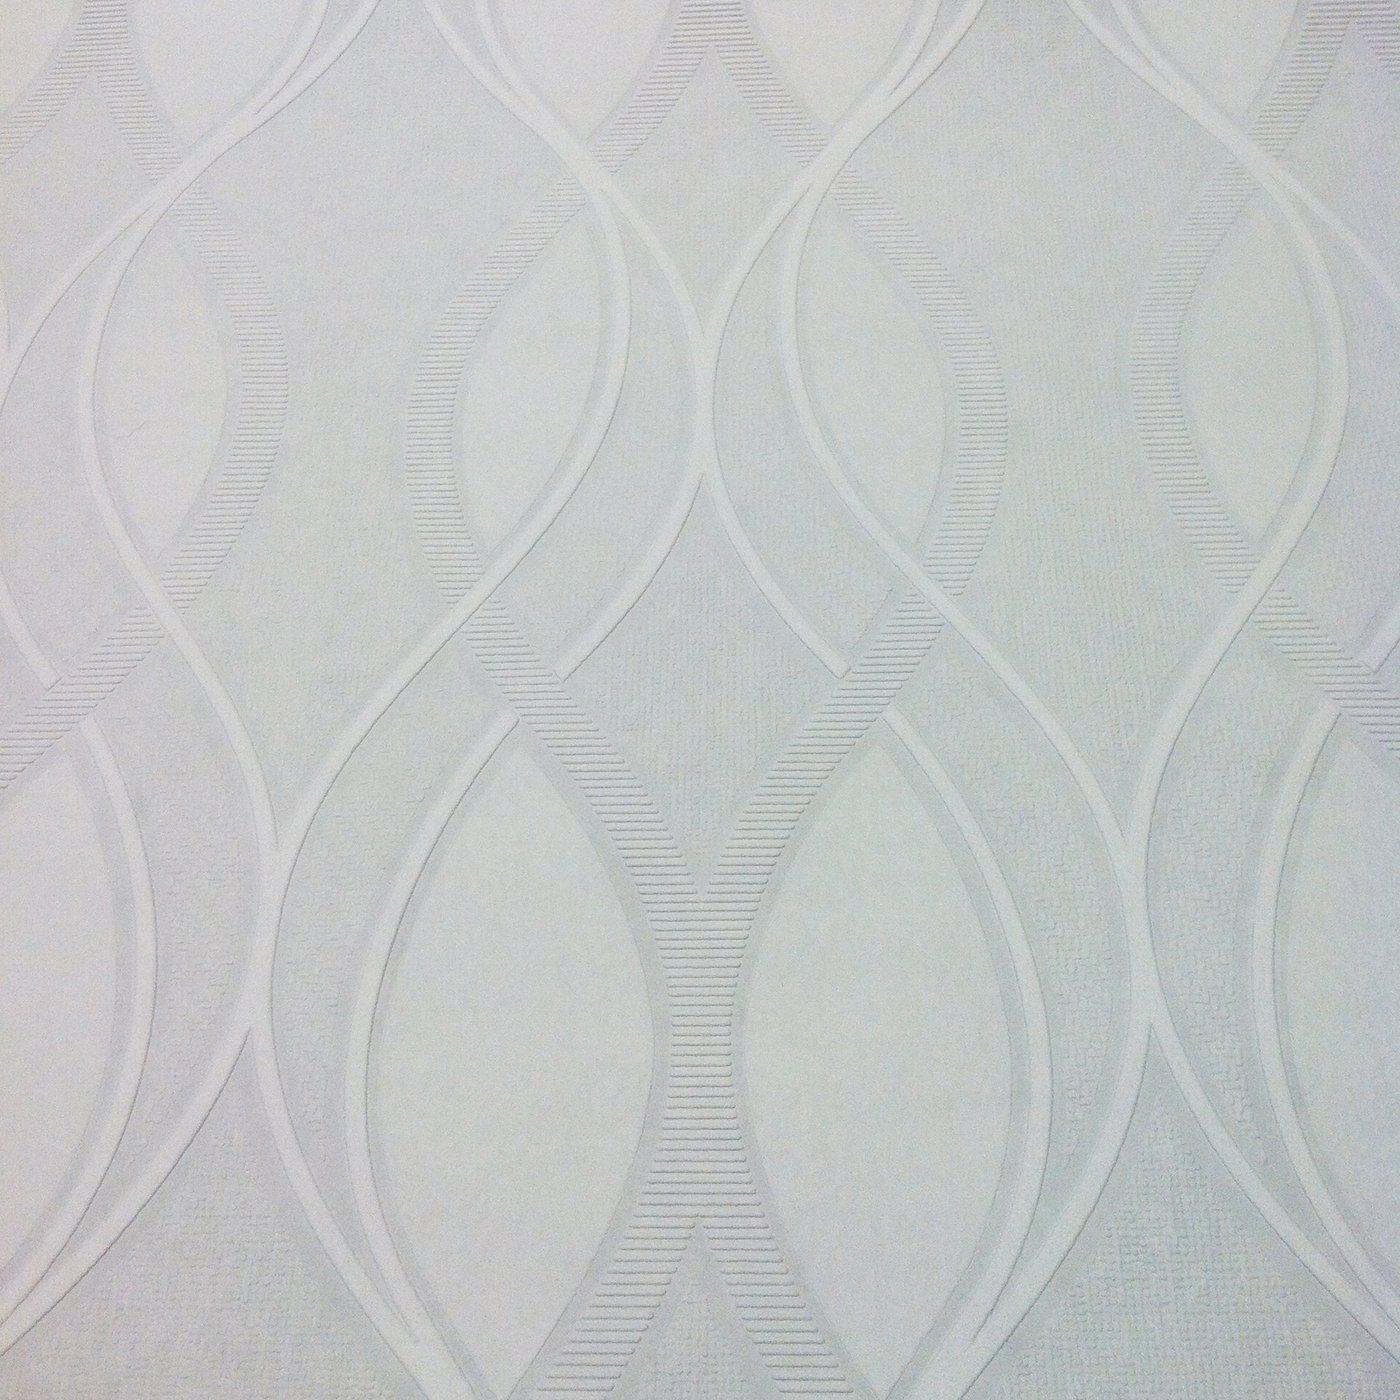 034 Superfresco Paintable Elliot Paintable Wallpaper Lowes Canada 1400x1400